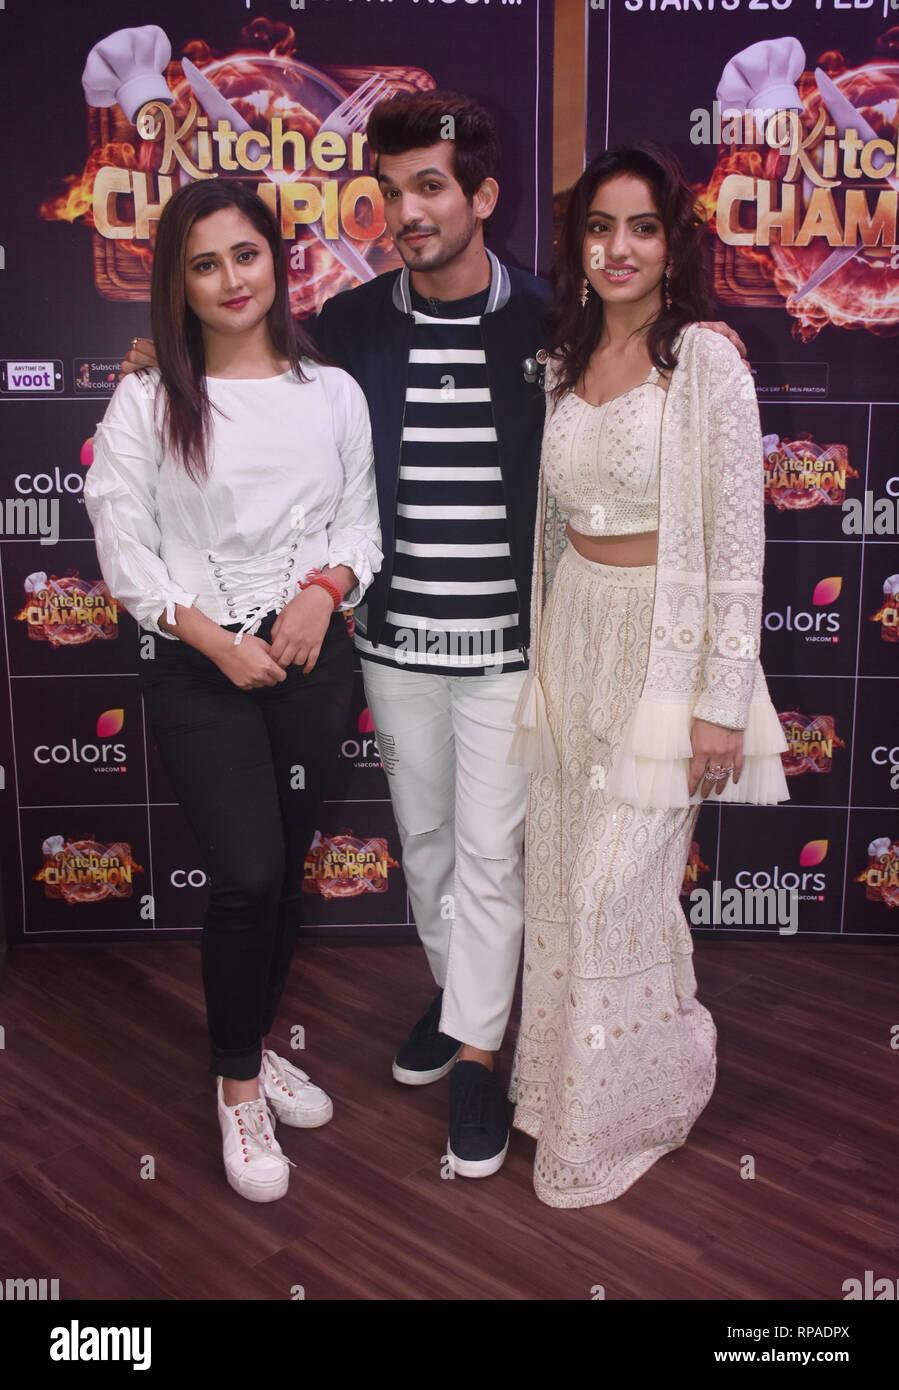 L-R: Indian television actress Rashami Desai, Arjun Bijlani and